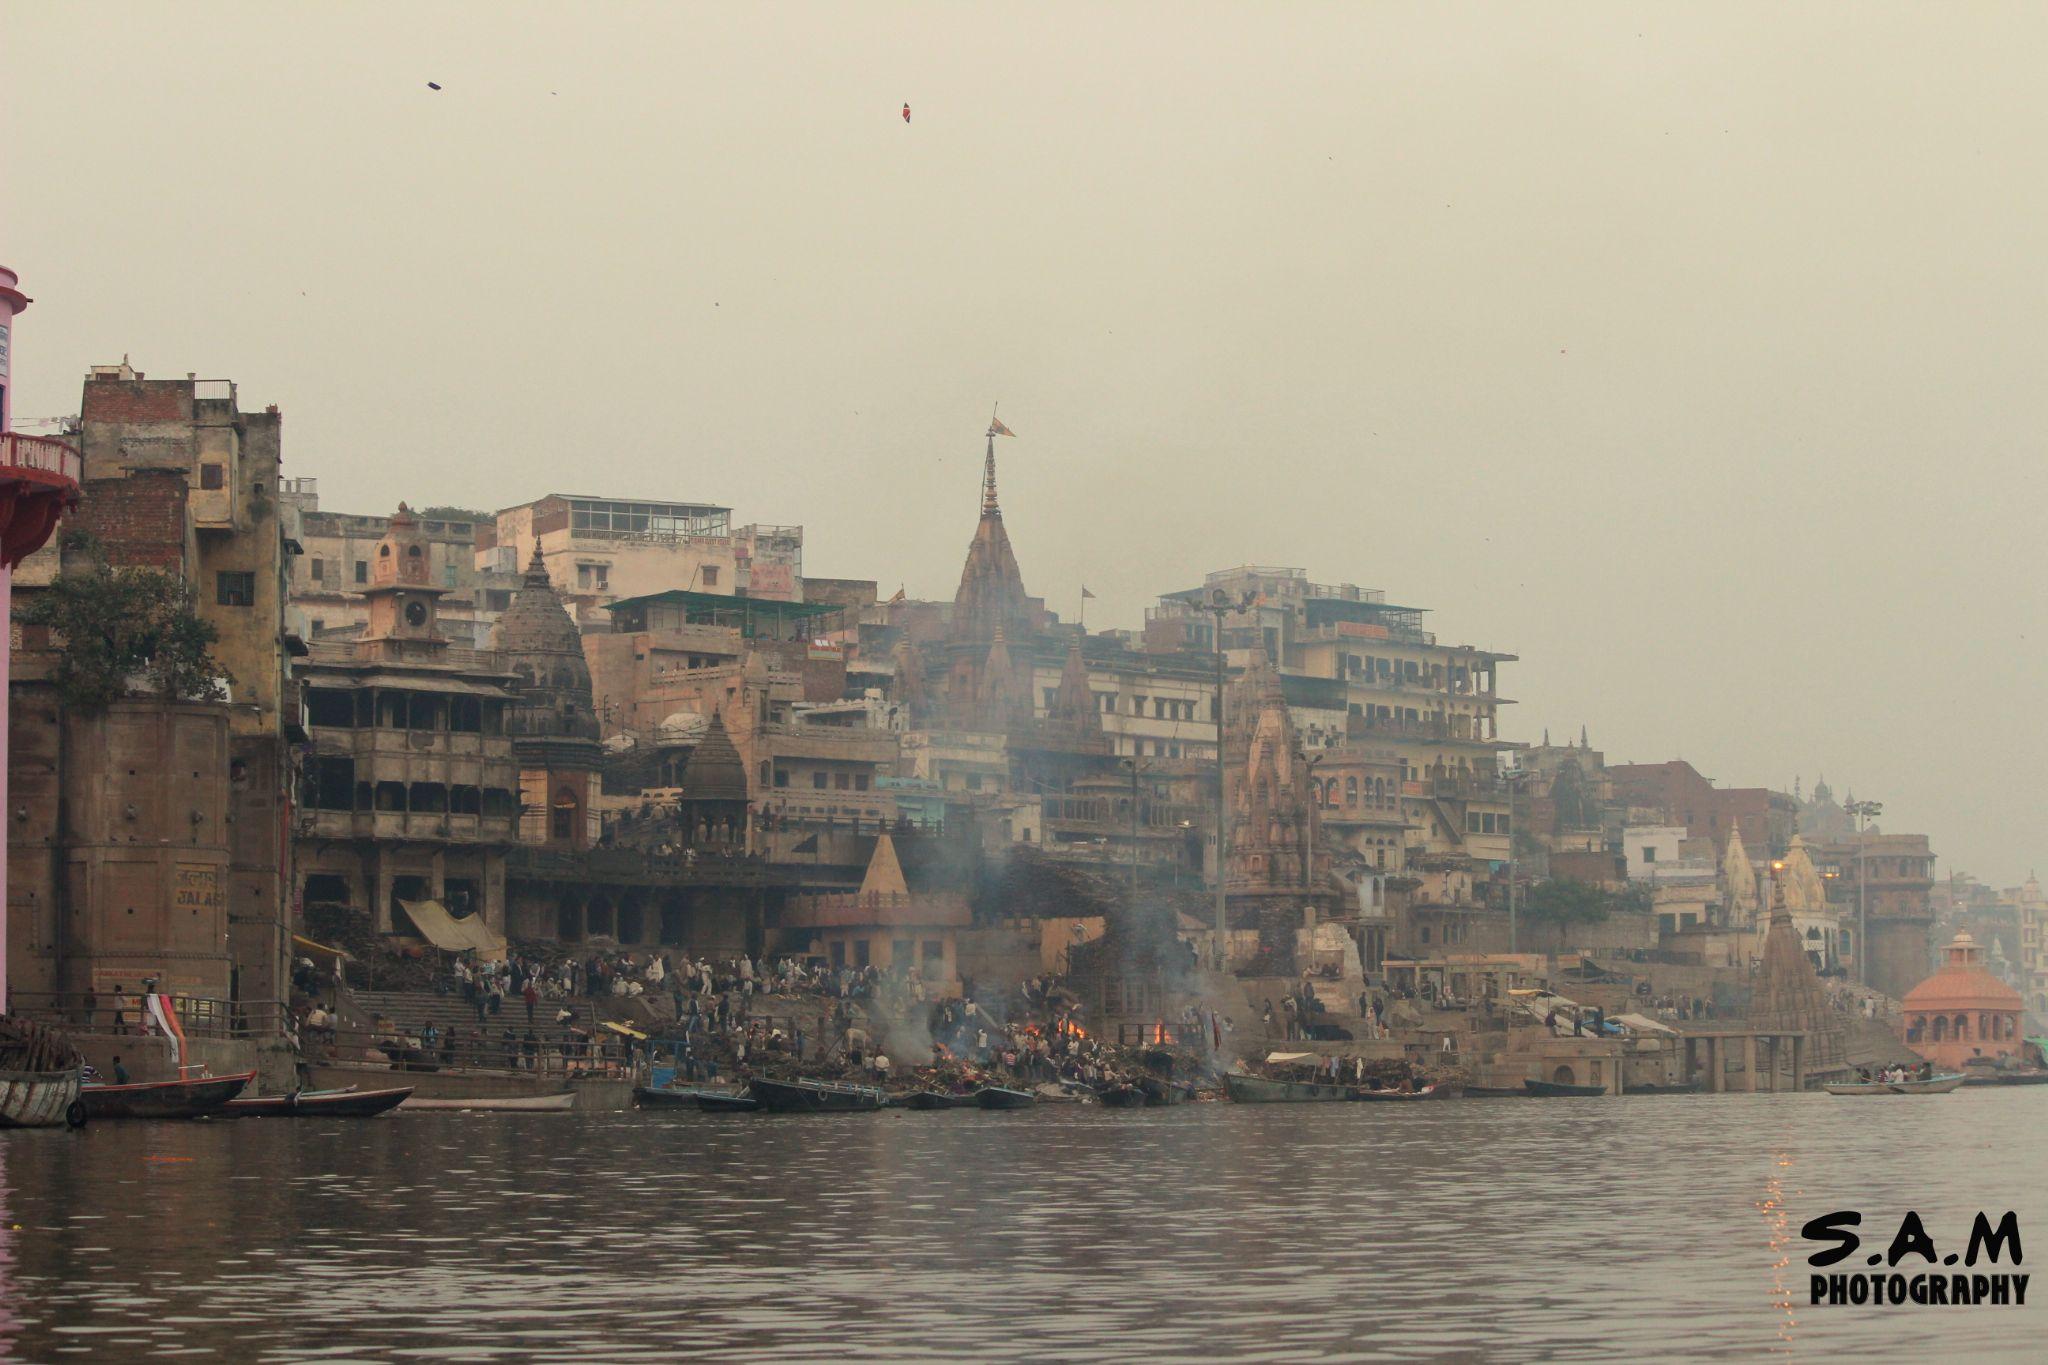 The Burning Ghats by Some Aditya Mandal